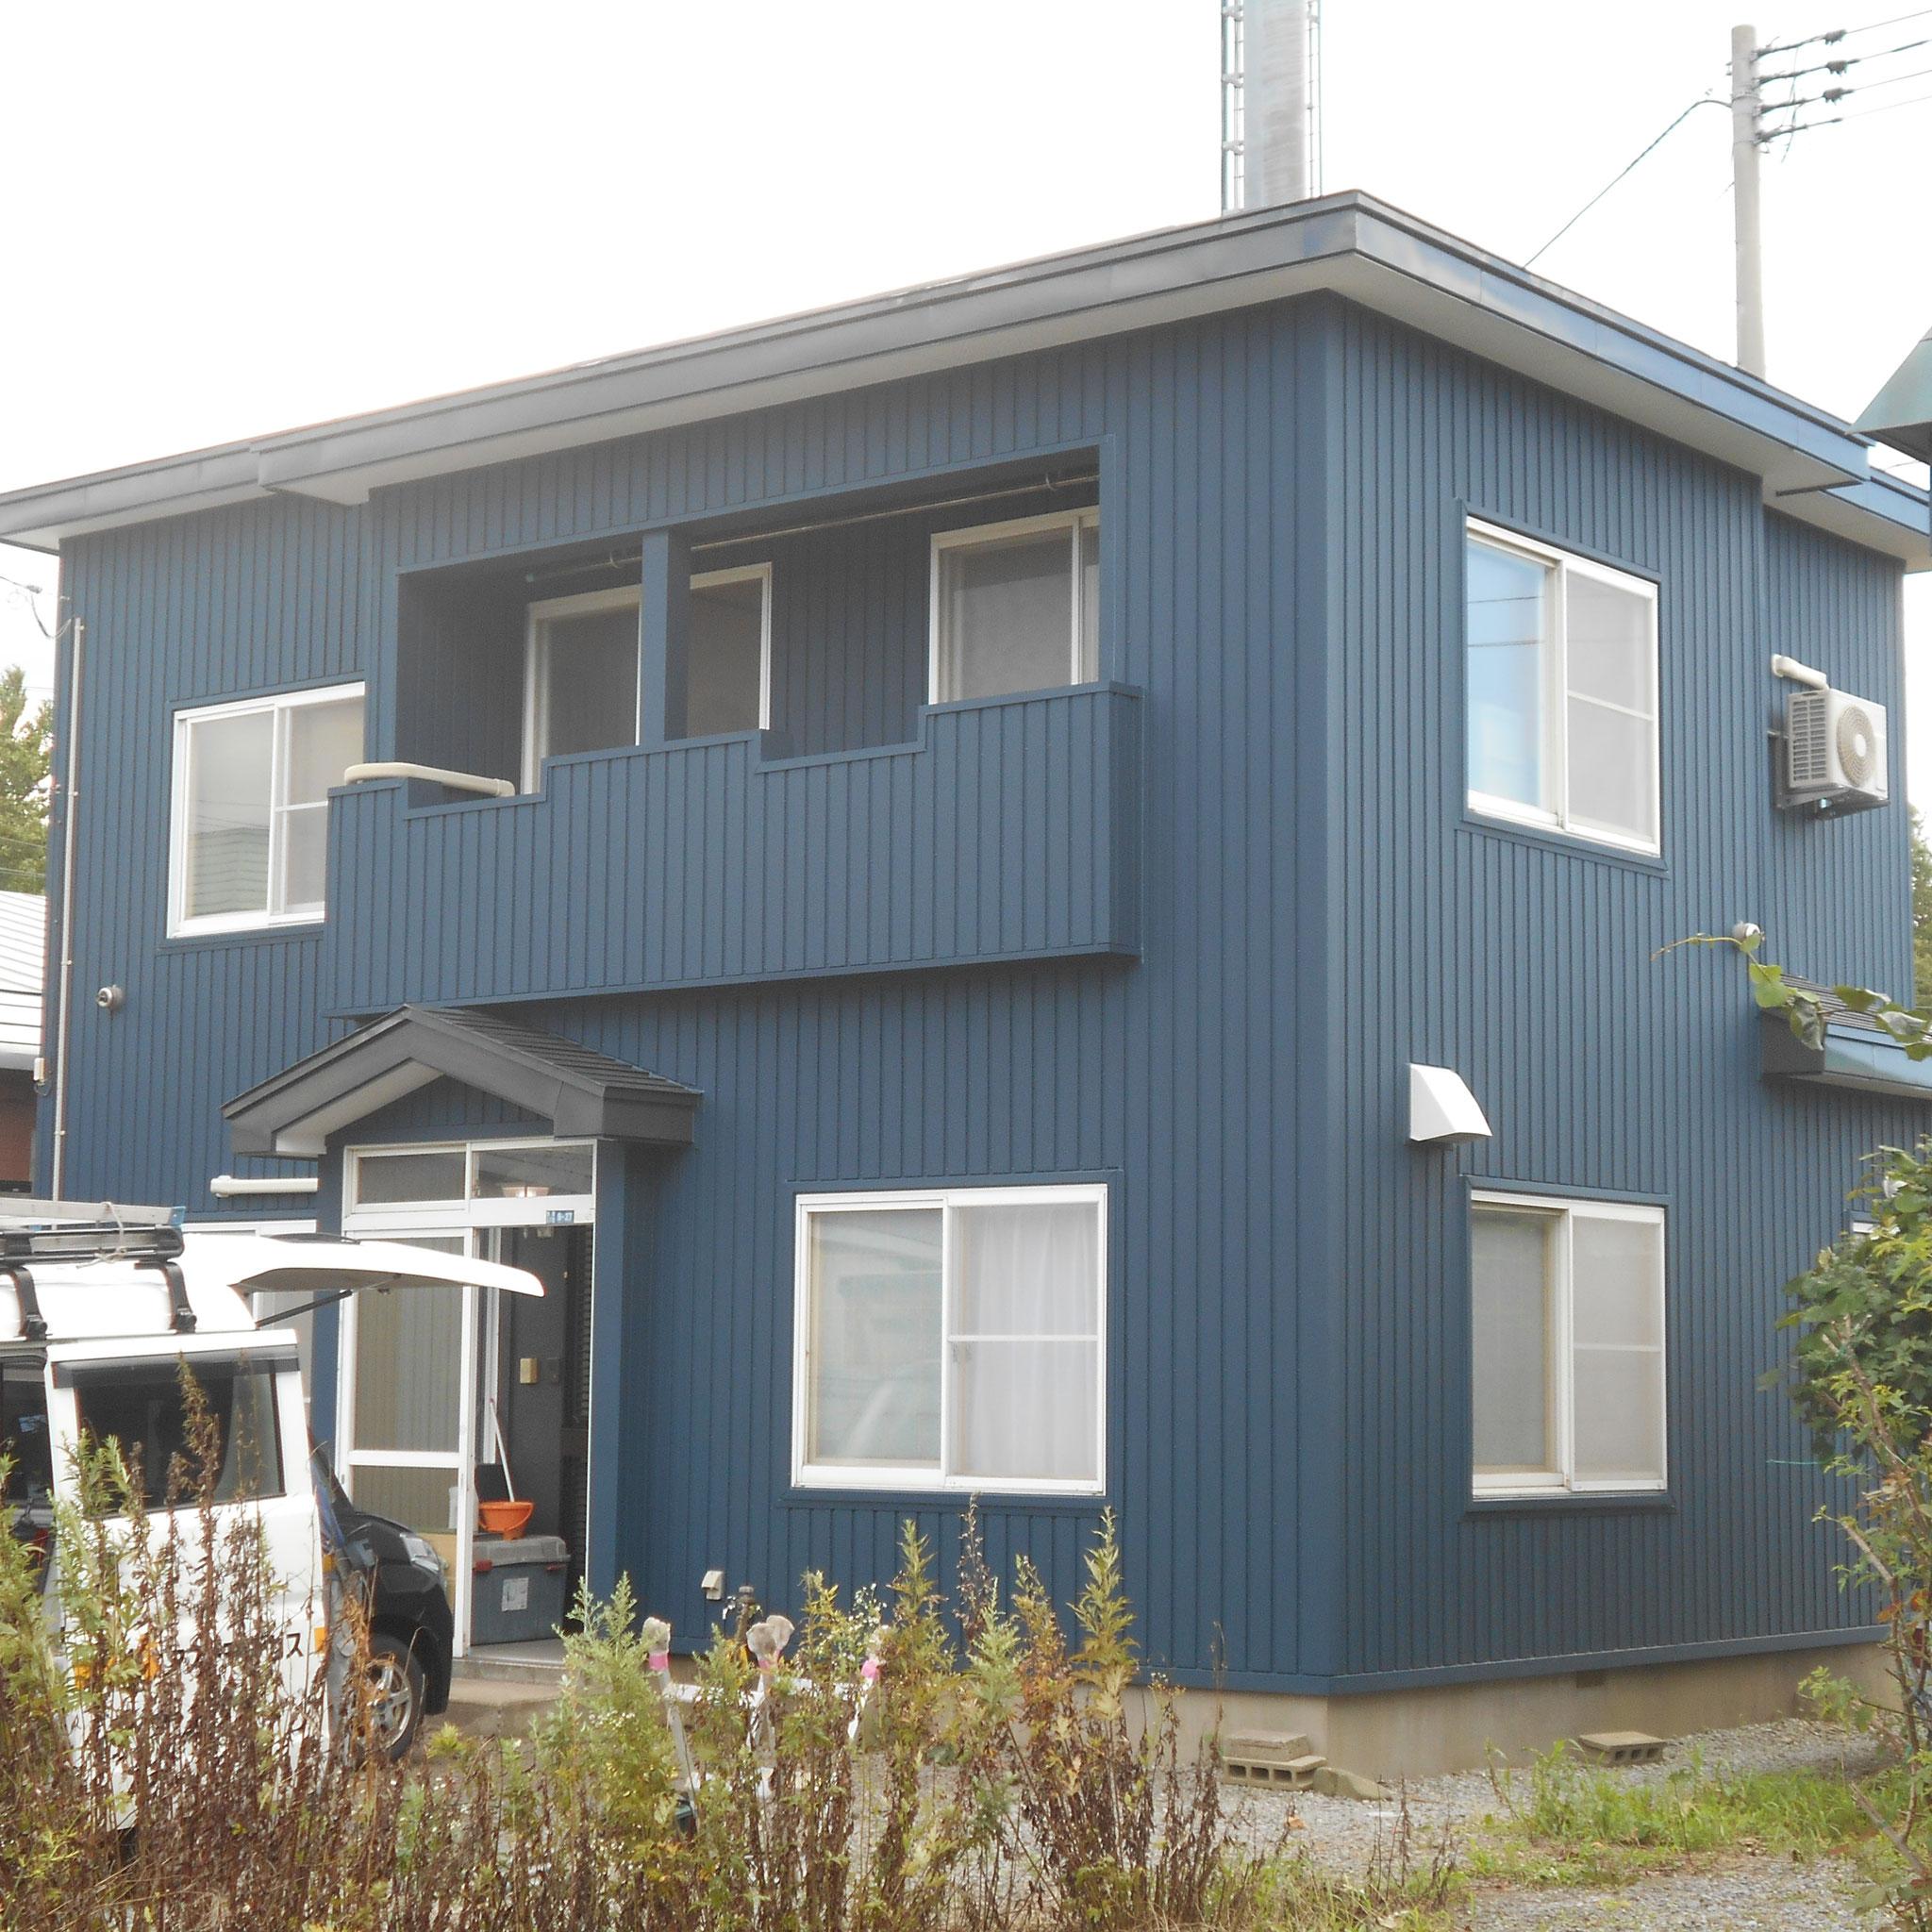 外壁工事 設計監理:㈱稲見建築設計事務所 施工:㈲エス・ティ・ケー